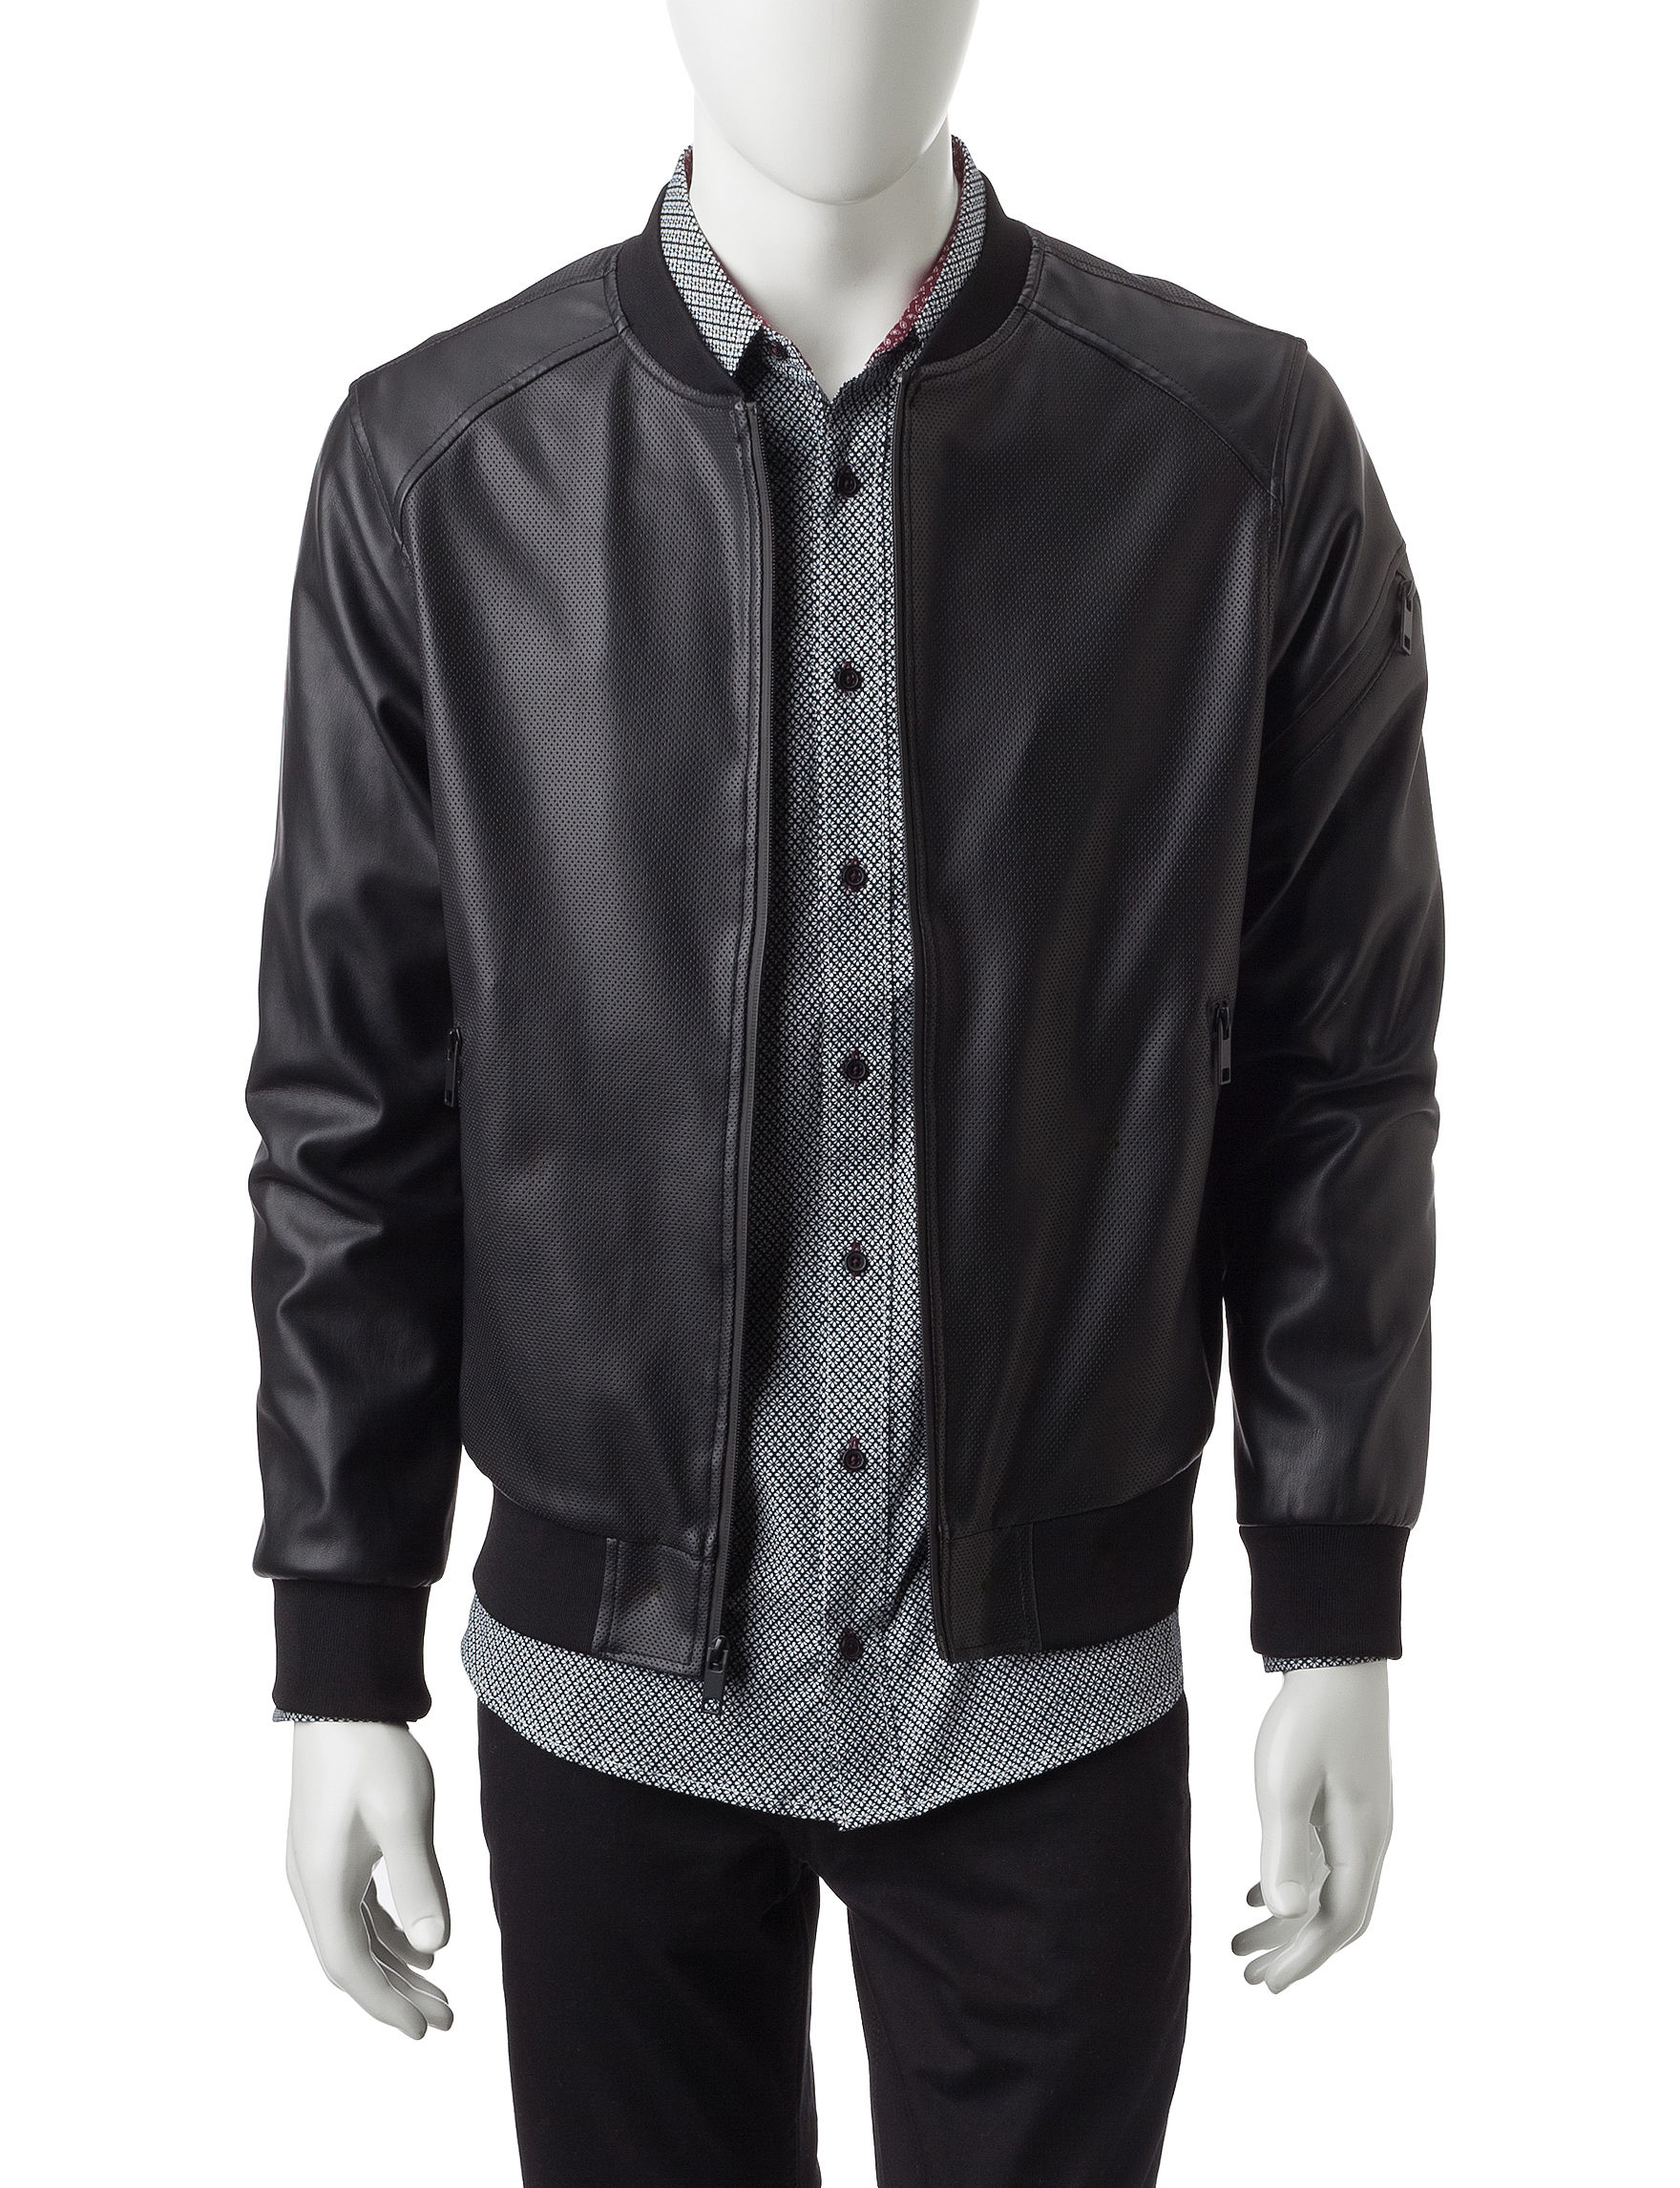 Signature Studio Black Lightweight Jackets & Blazers